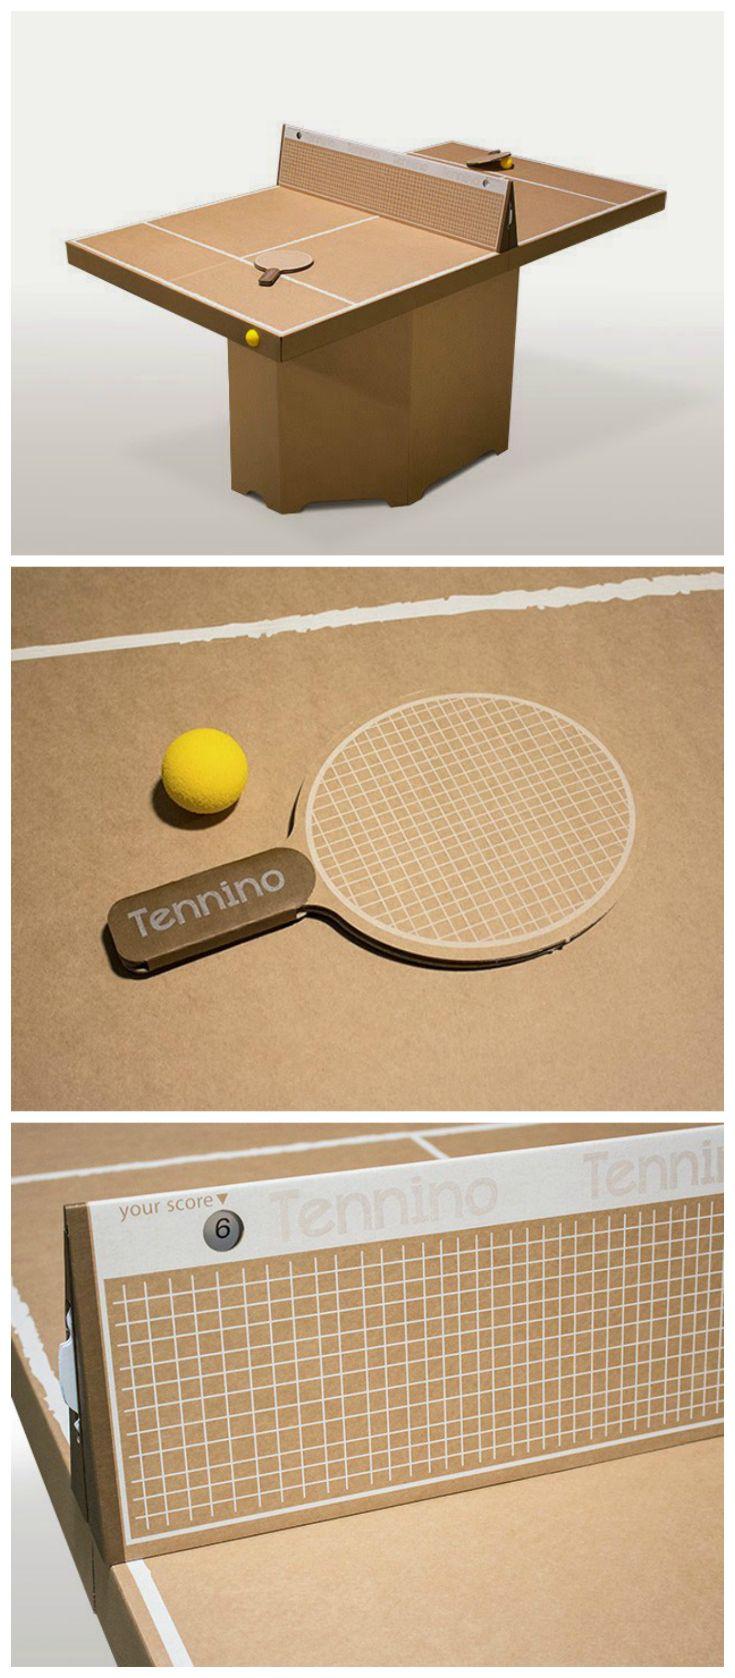 Tennino, A Cardboard Play Table Tennis